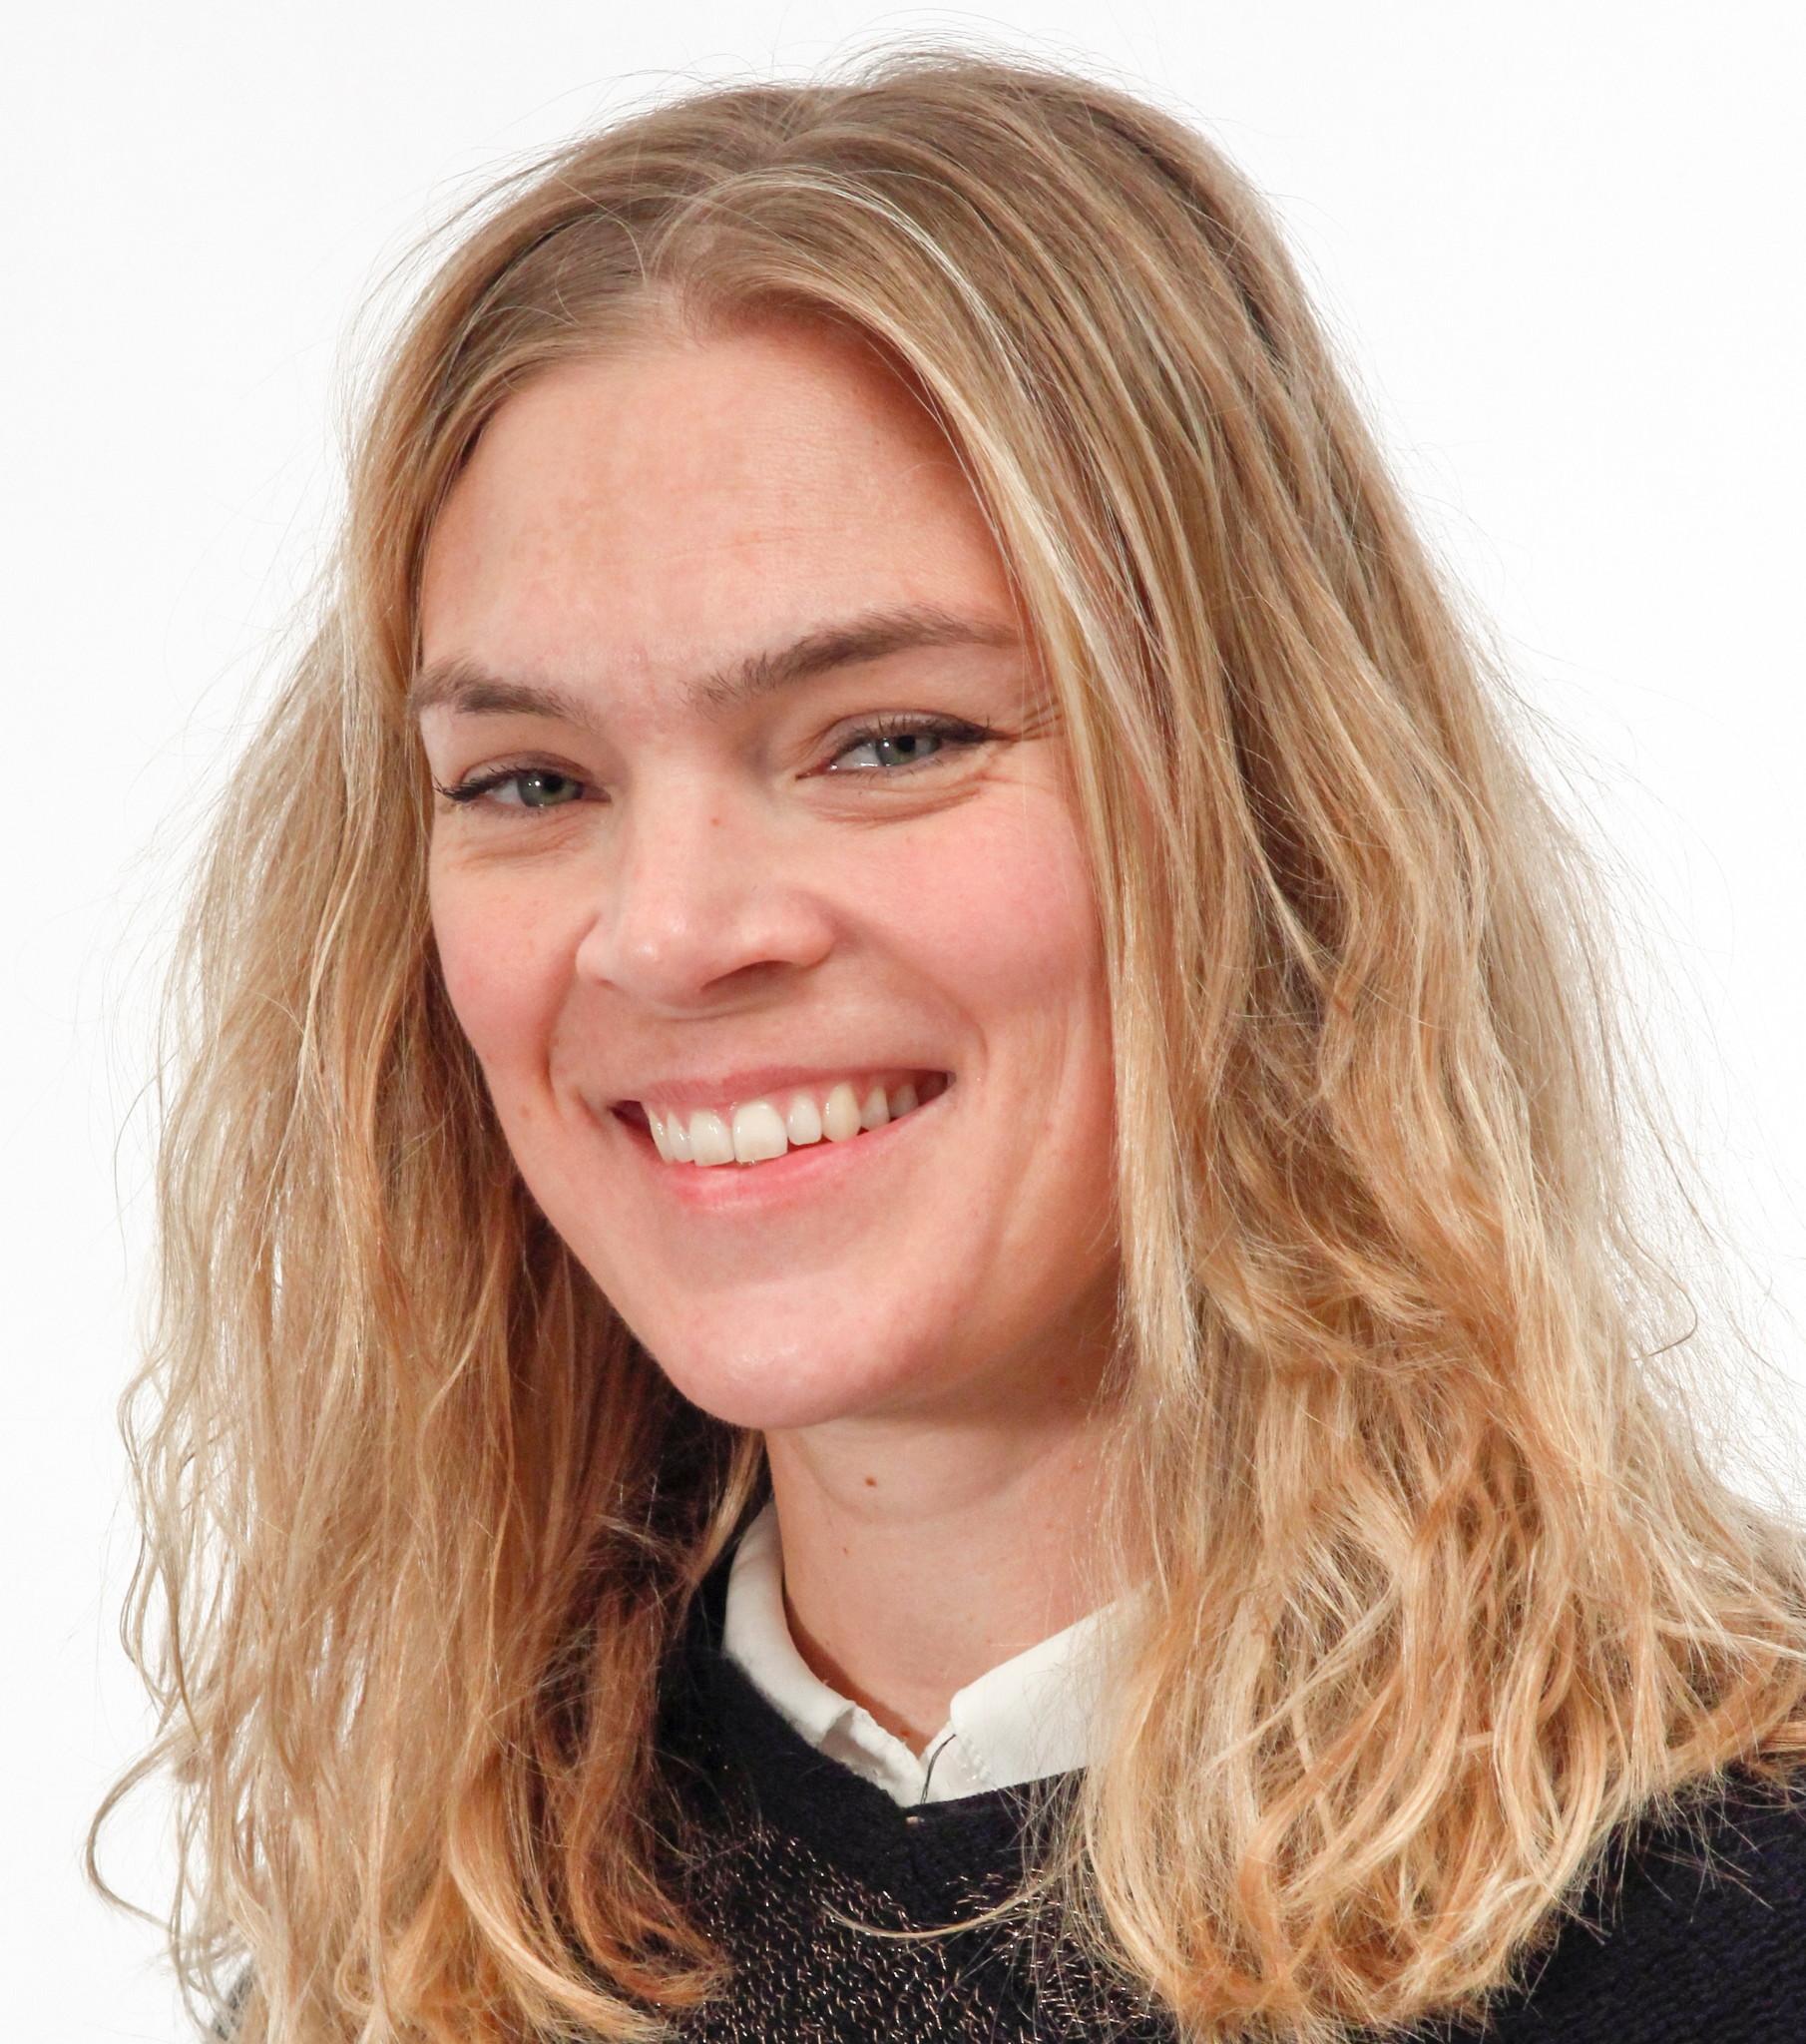 Emma Lindeblad